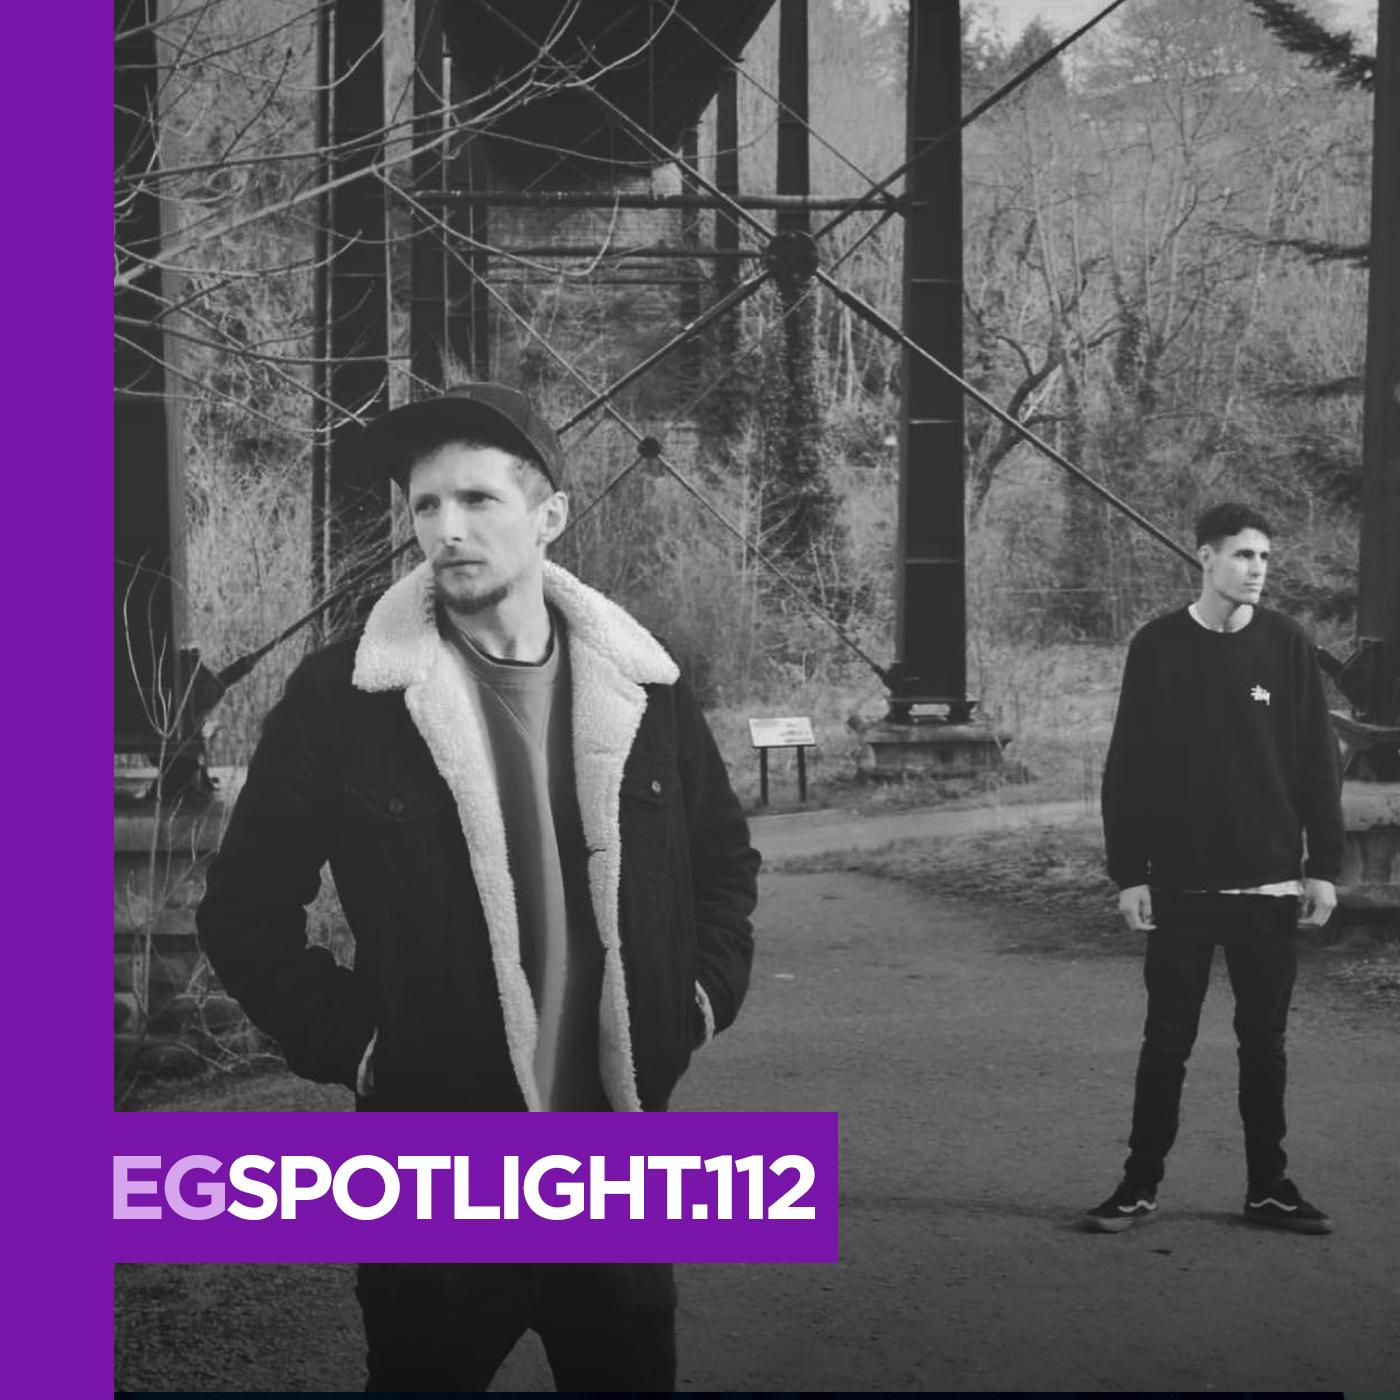 EG-SPOTLIGHT.112-Wacko-Leedman